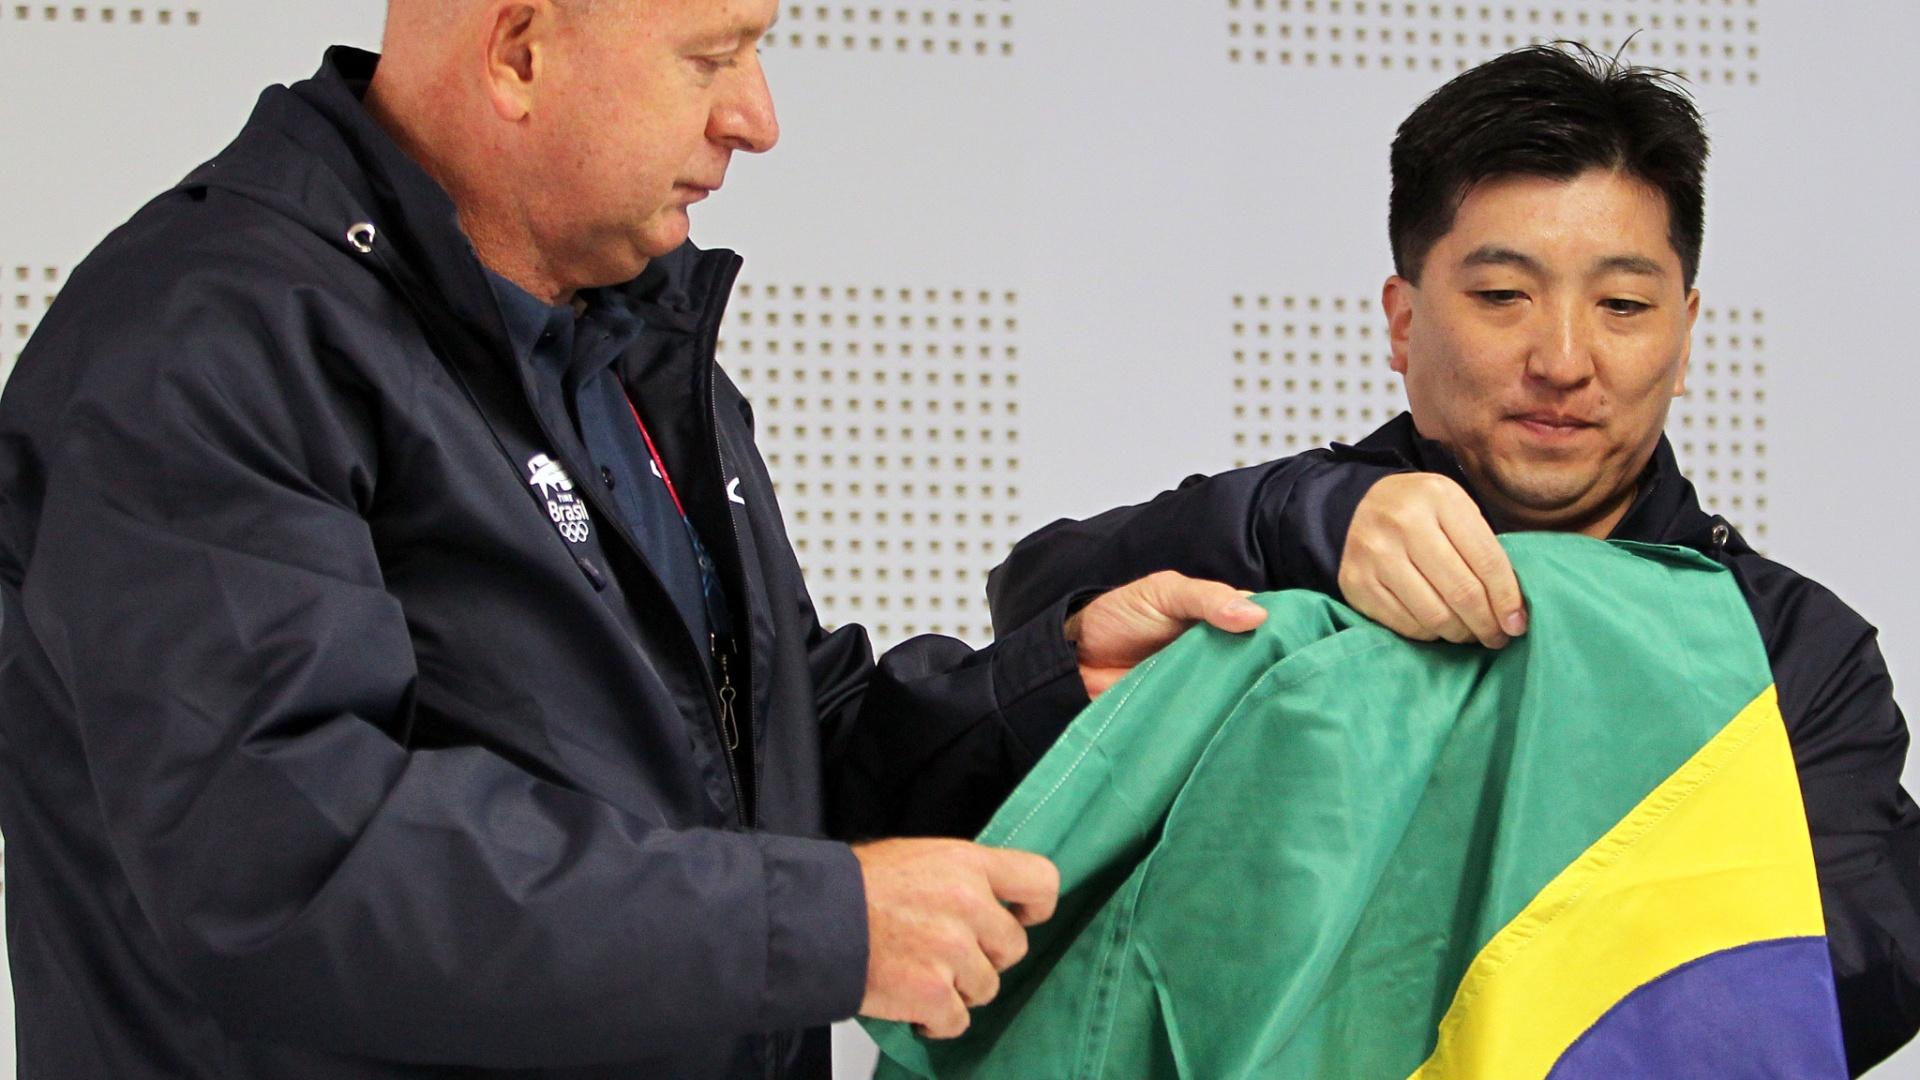 Hugo Hoyama recebe bandeira para carregar na abertura do Pan-Americano